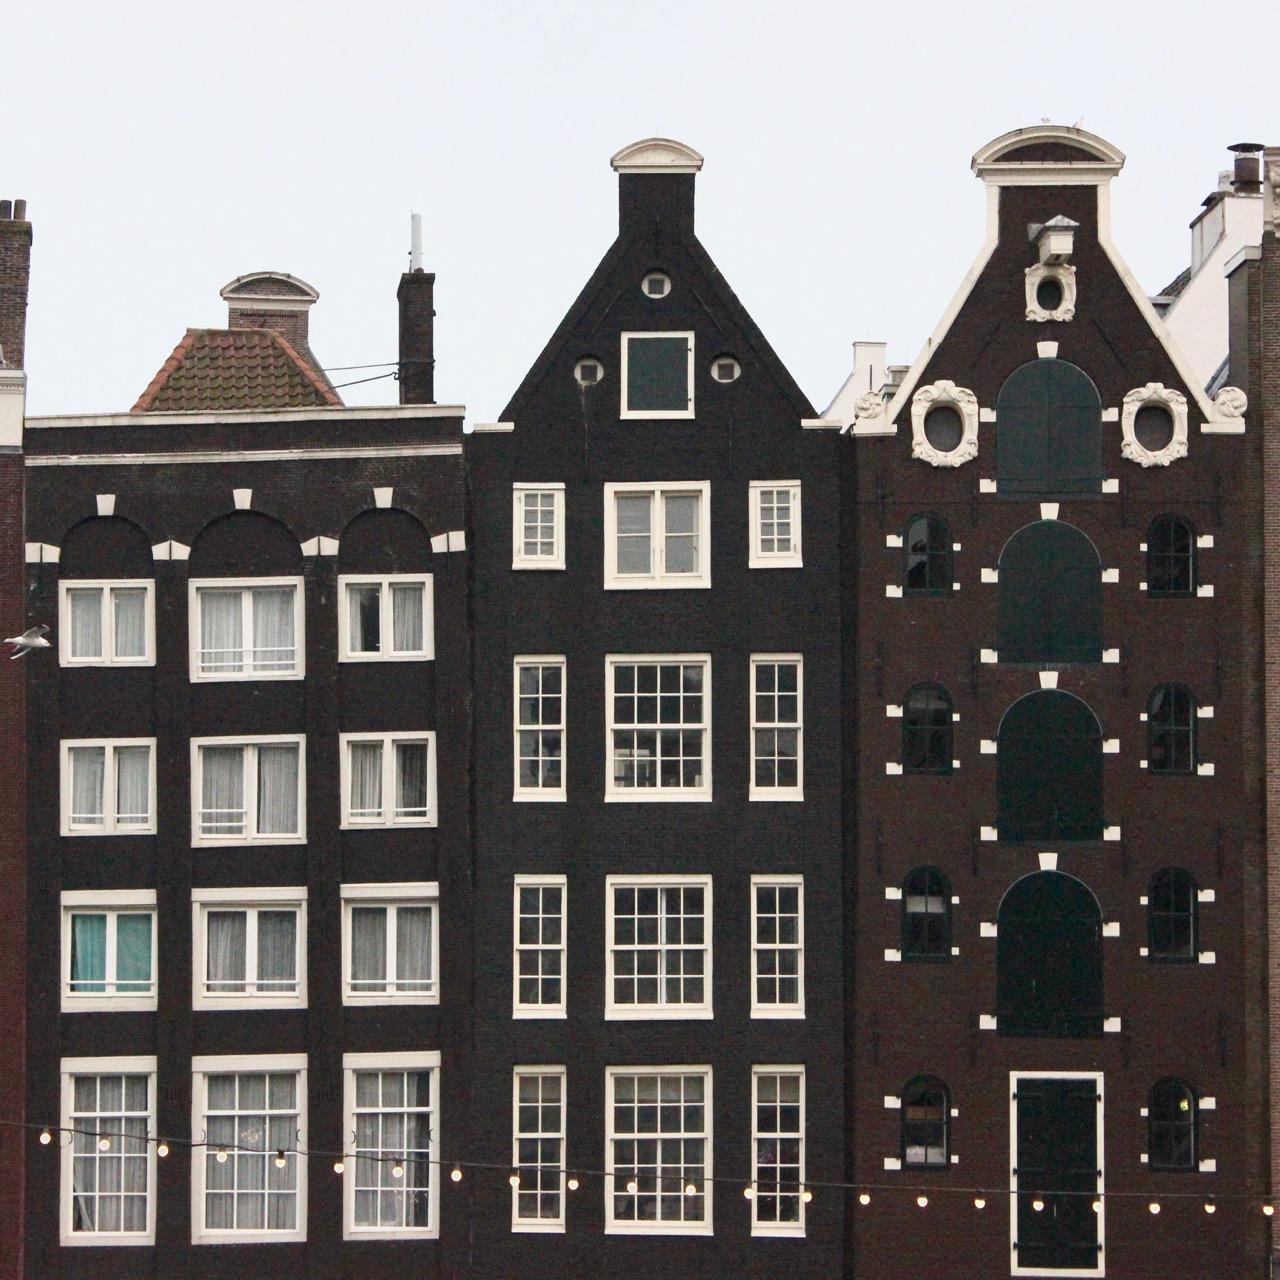 Amsterdam, Netherlands - 18